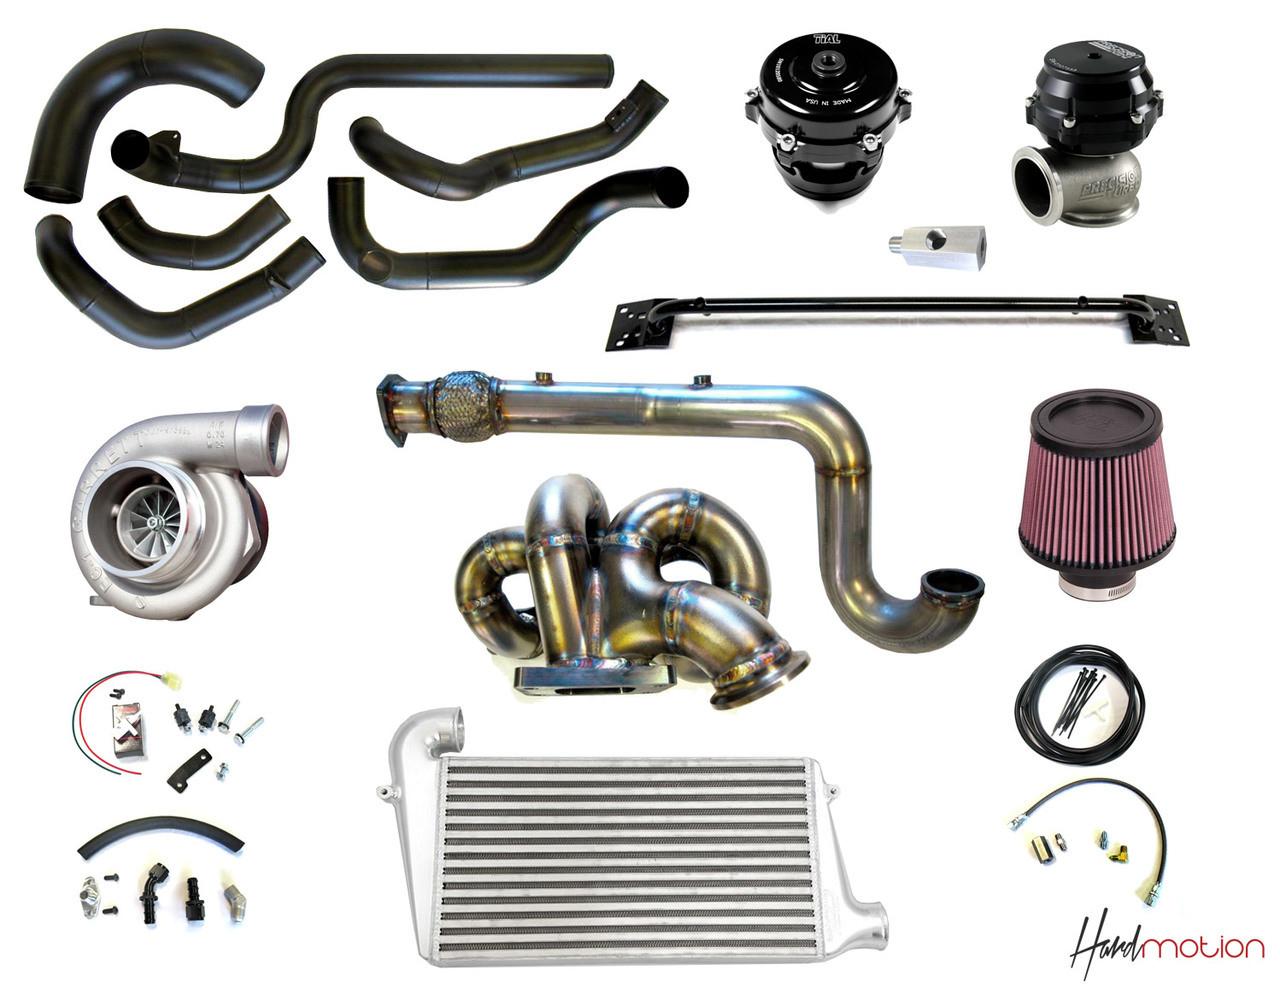 PRL Motorsports 2006-2011 Honda Civic Si Turbo Kit 8th Gen